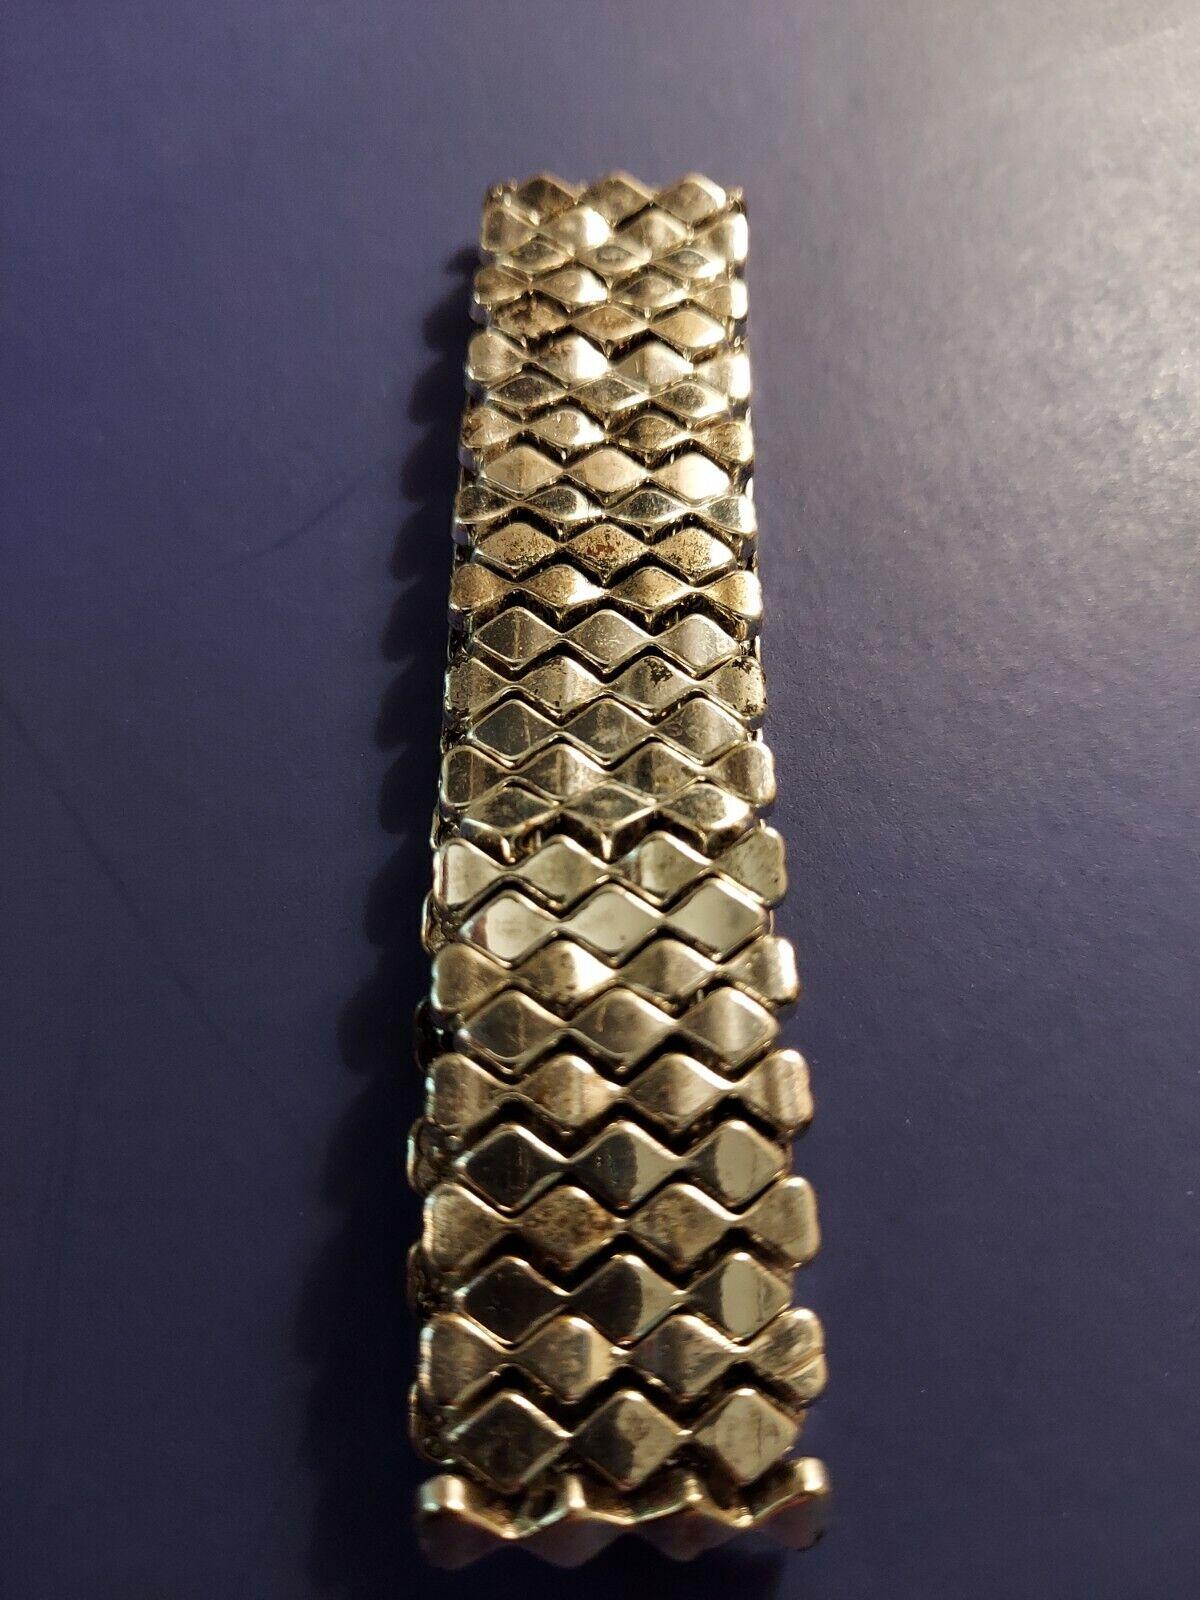 Bracelet Lot, Costume Jewelry - image 6